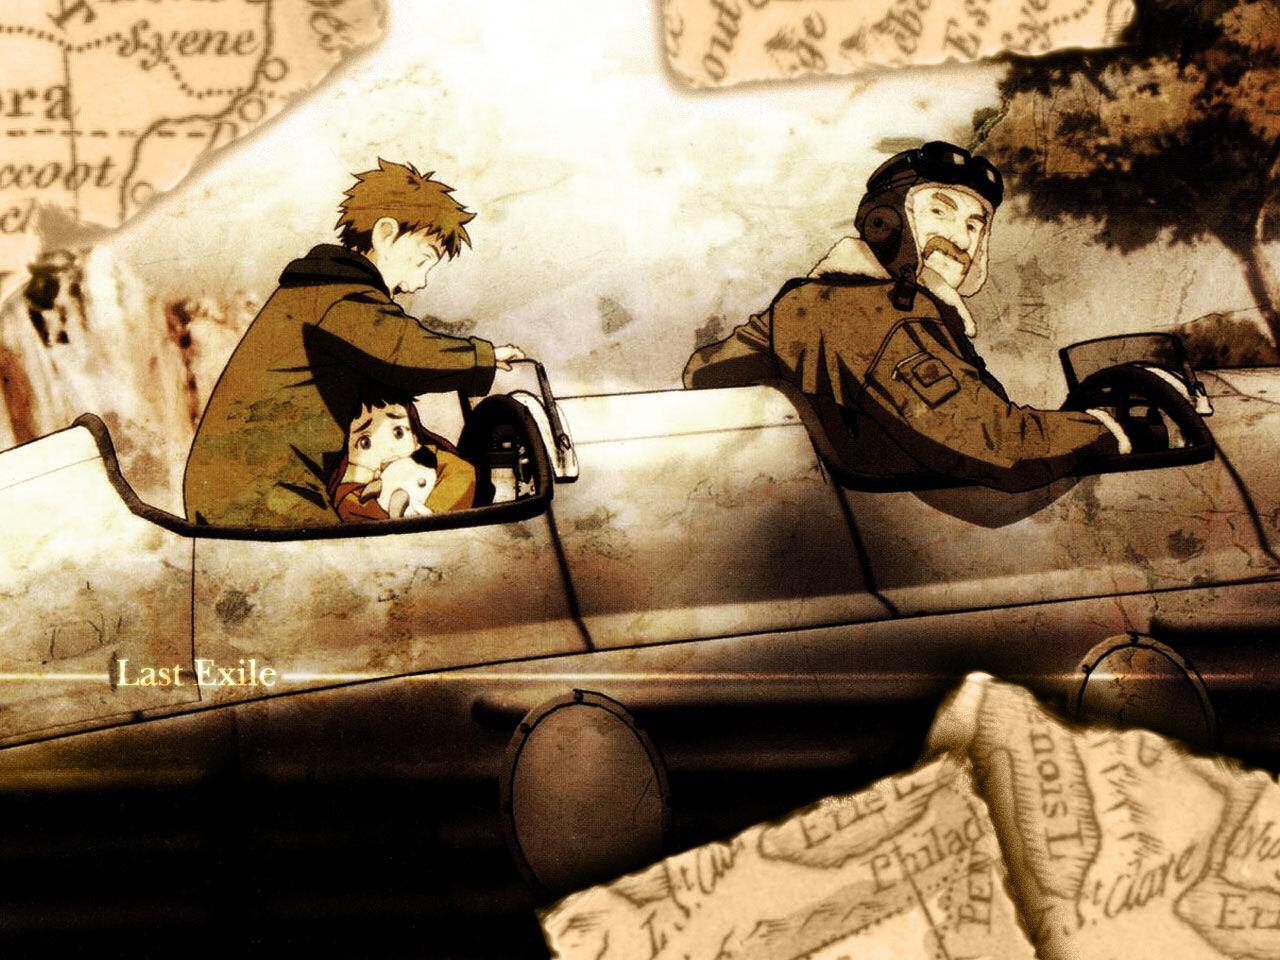 Anime Last Exile Wallpaper 1280x960 Anime Last Exile 1280x960